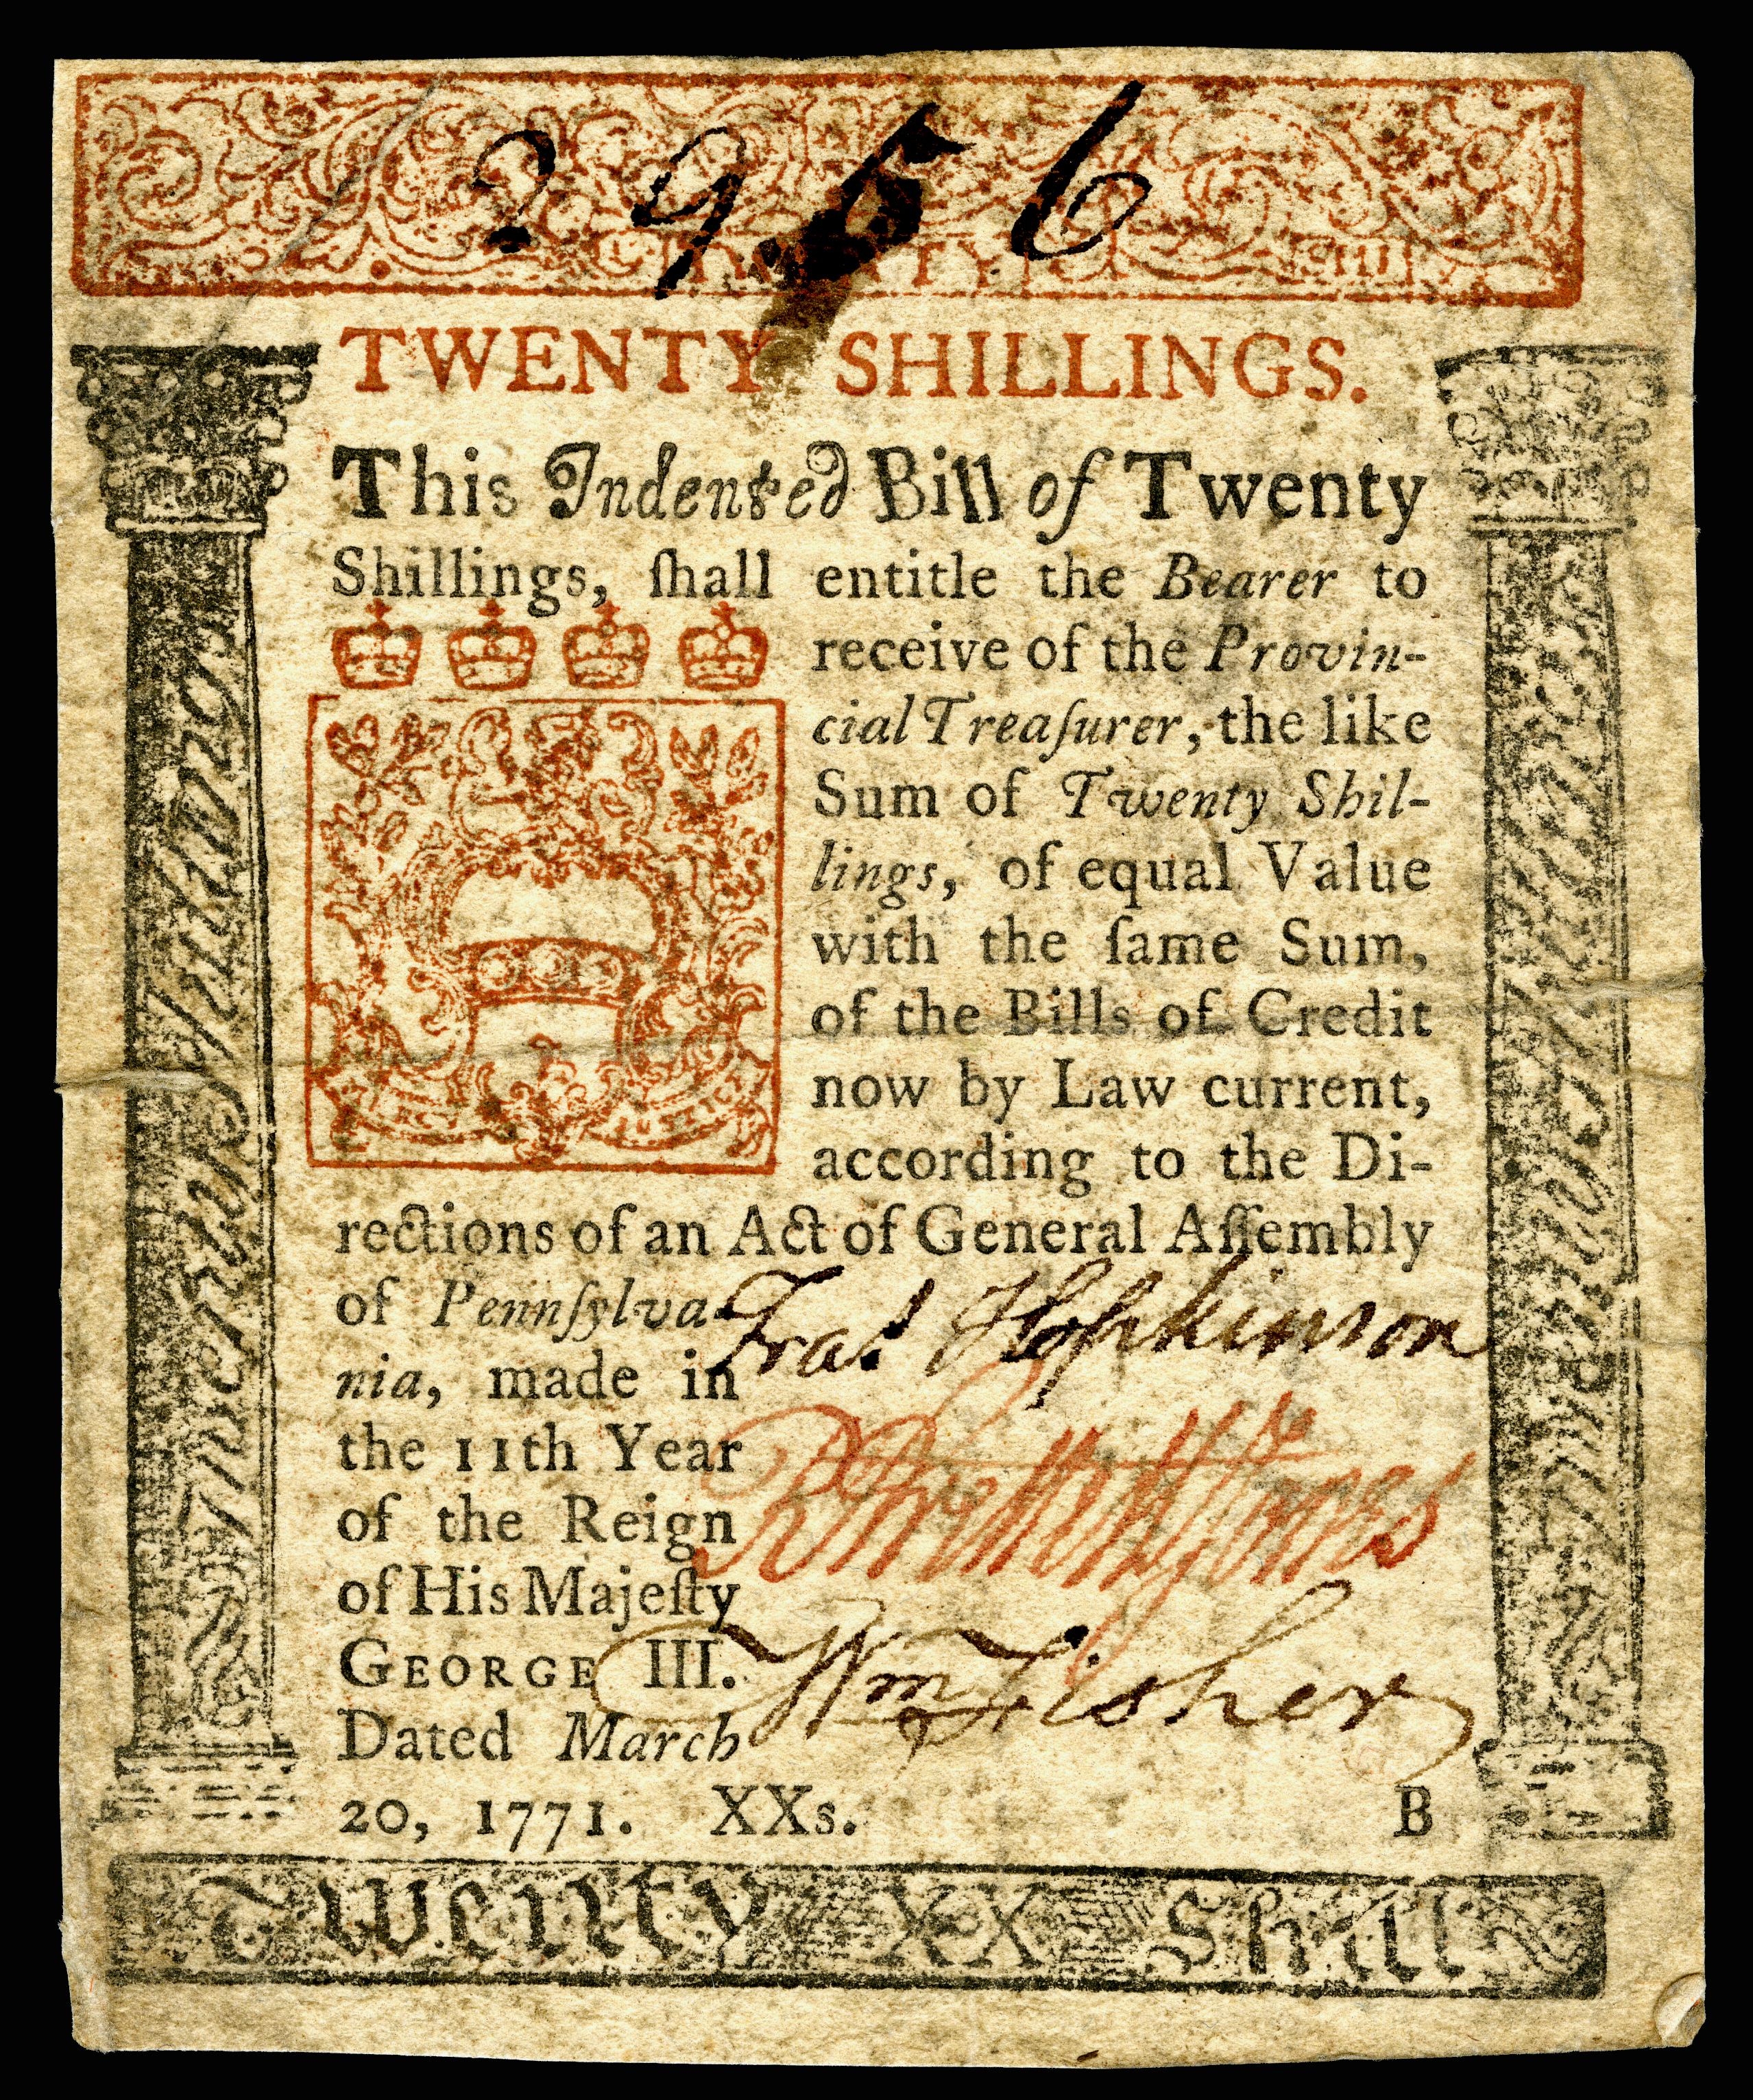 File:US-Colonial (PA-149)-Pennsylvania-20 Mar 1771